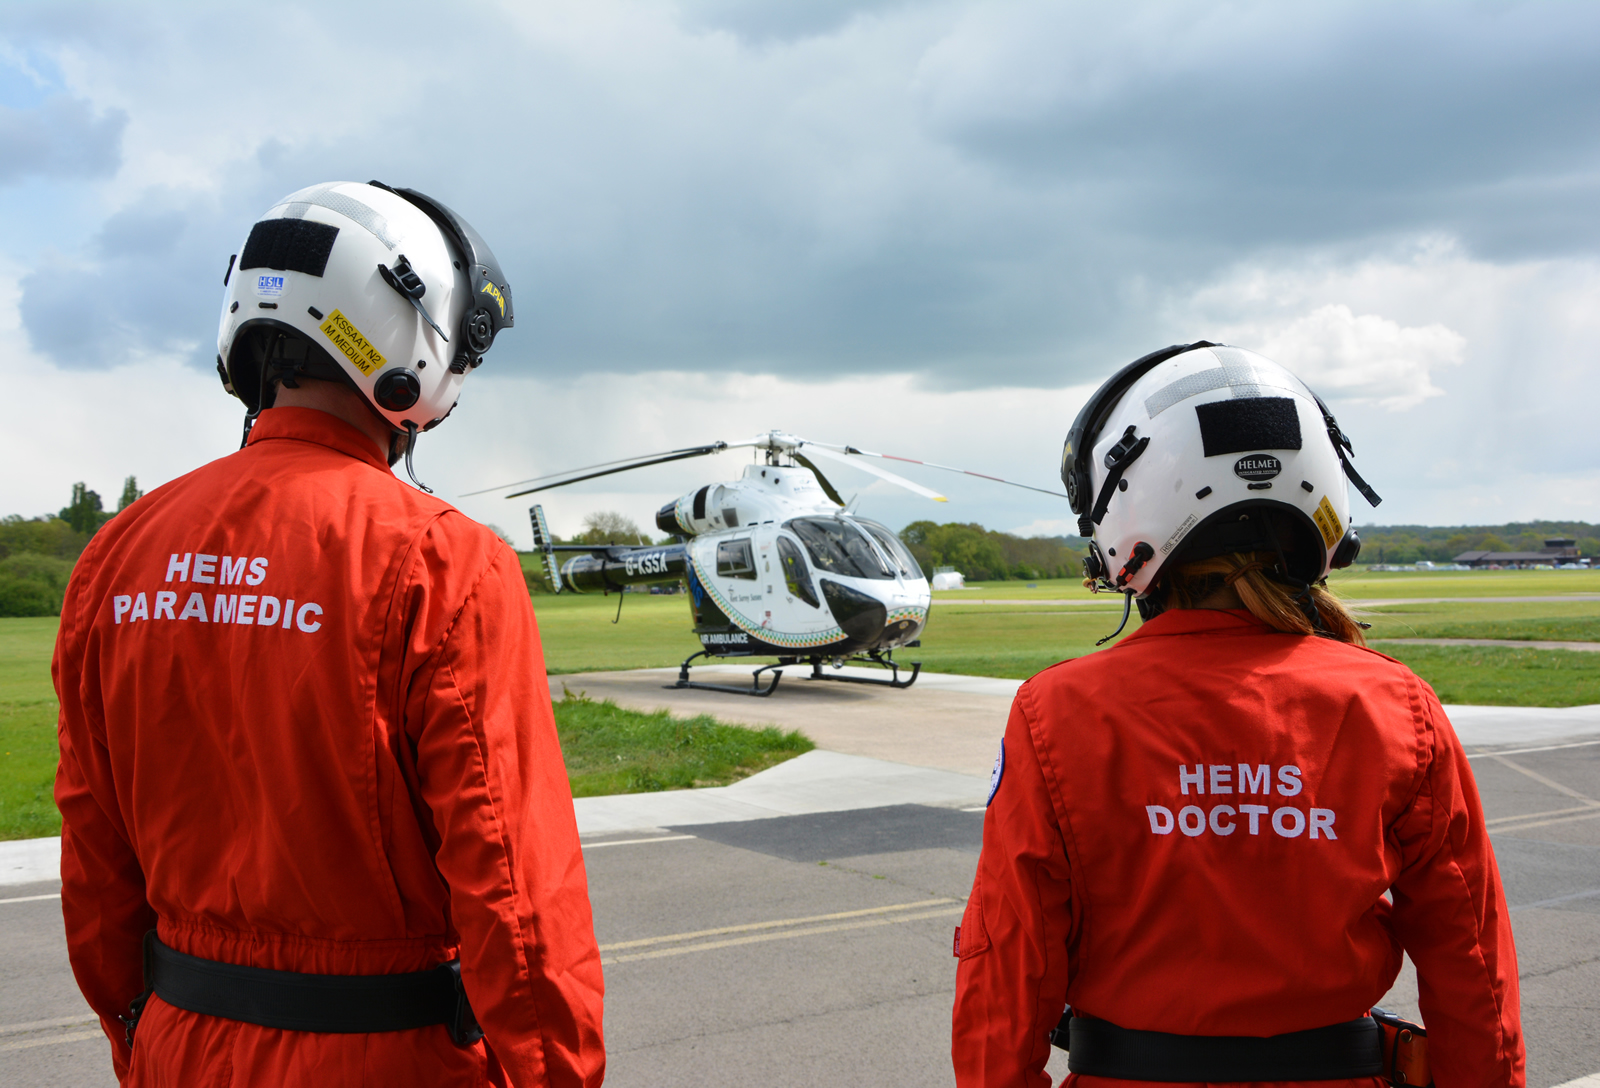 Kent, Surrey & Sussex Air Ambulance HEMS Doctor and Paramedic